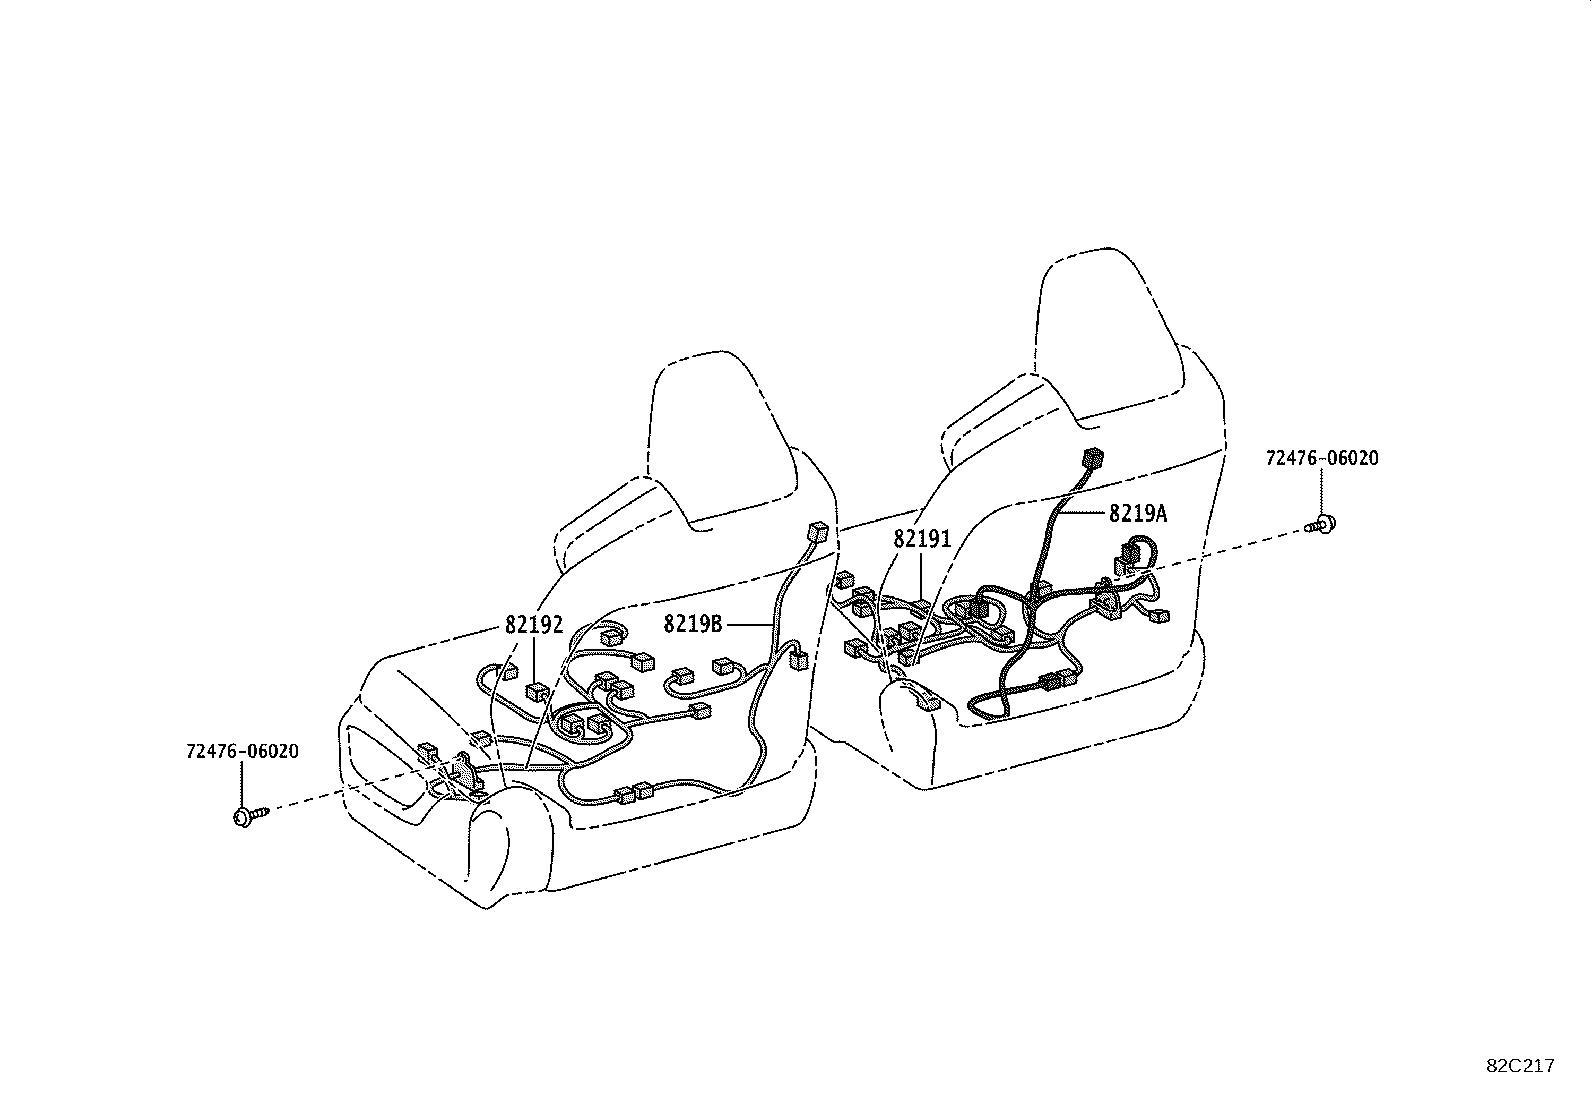 Lexus Es 350 Protector Wiring Harness No 4 Wiring